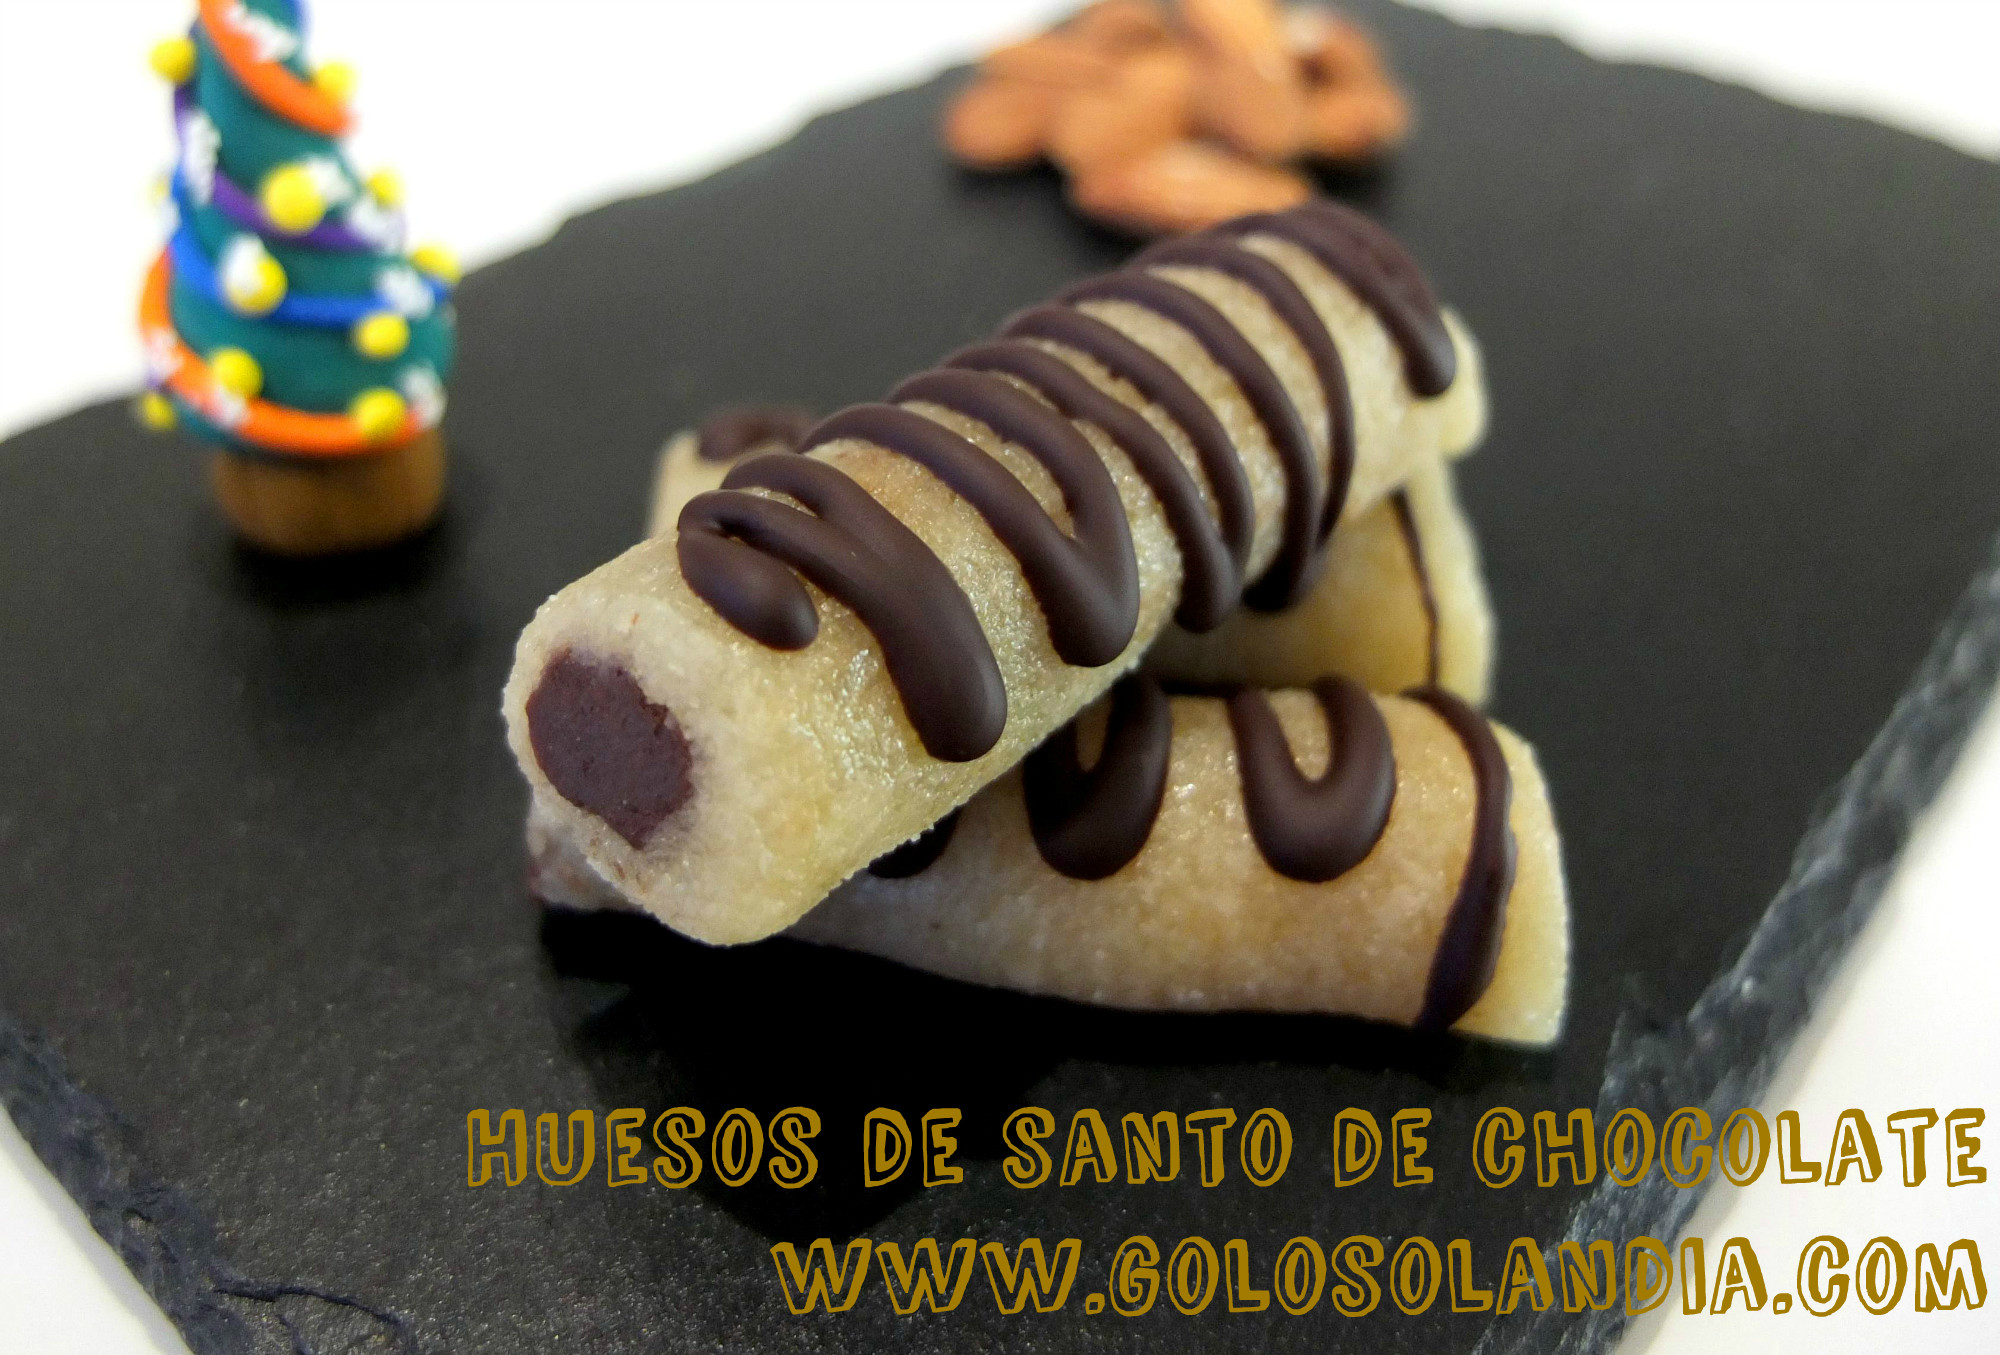 Huesos de santo de chocolate